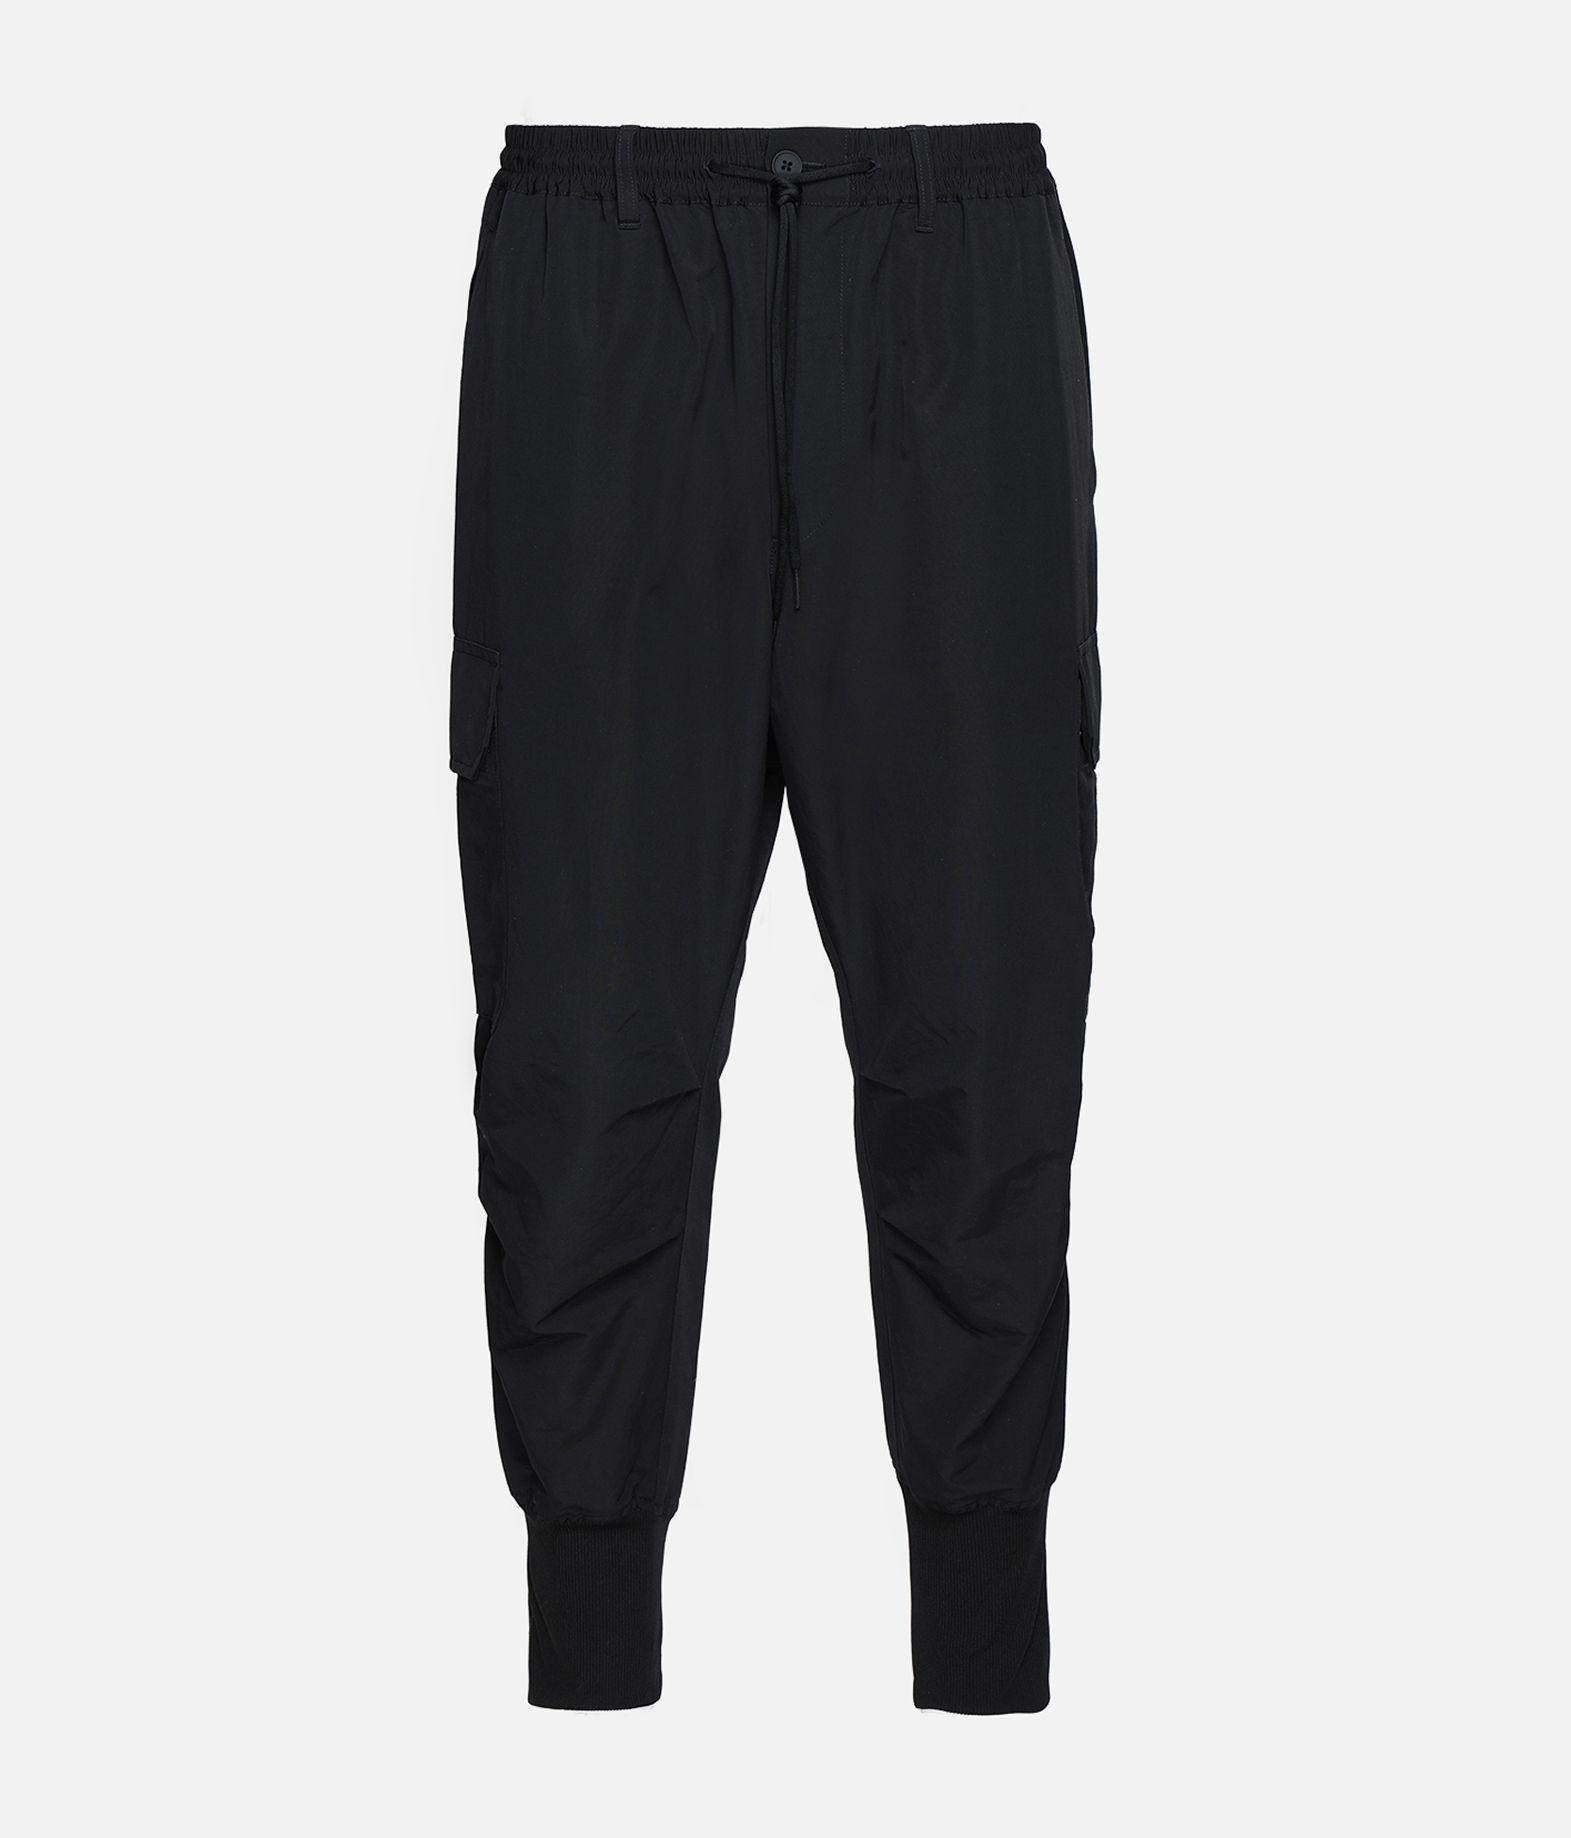 Y-3 Y-3 Nylon Cargo Pants パンツ メンズ f